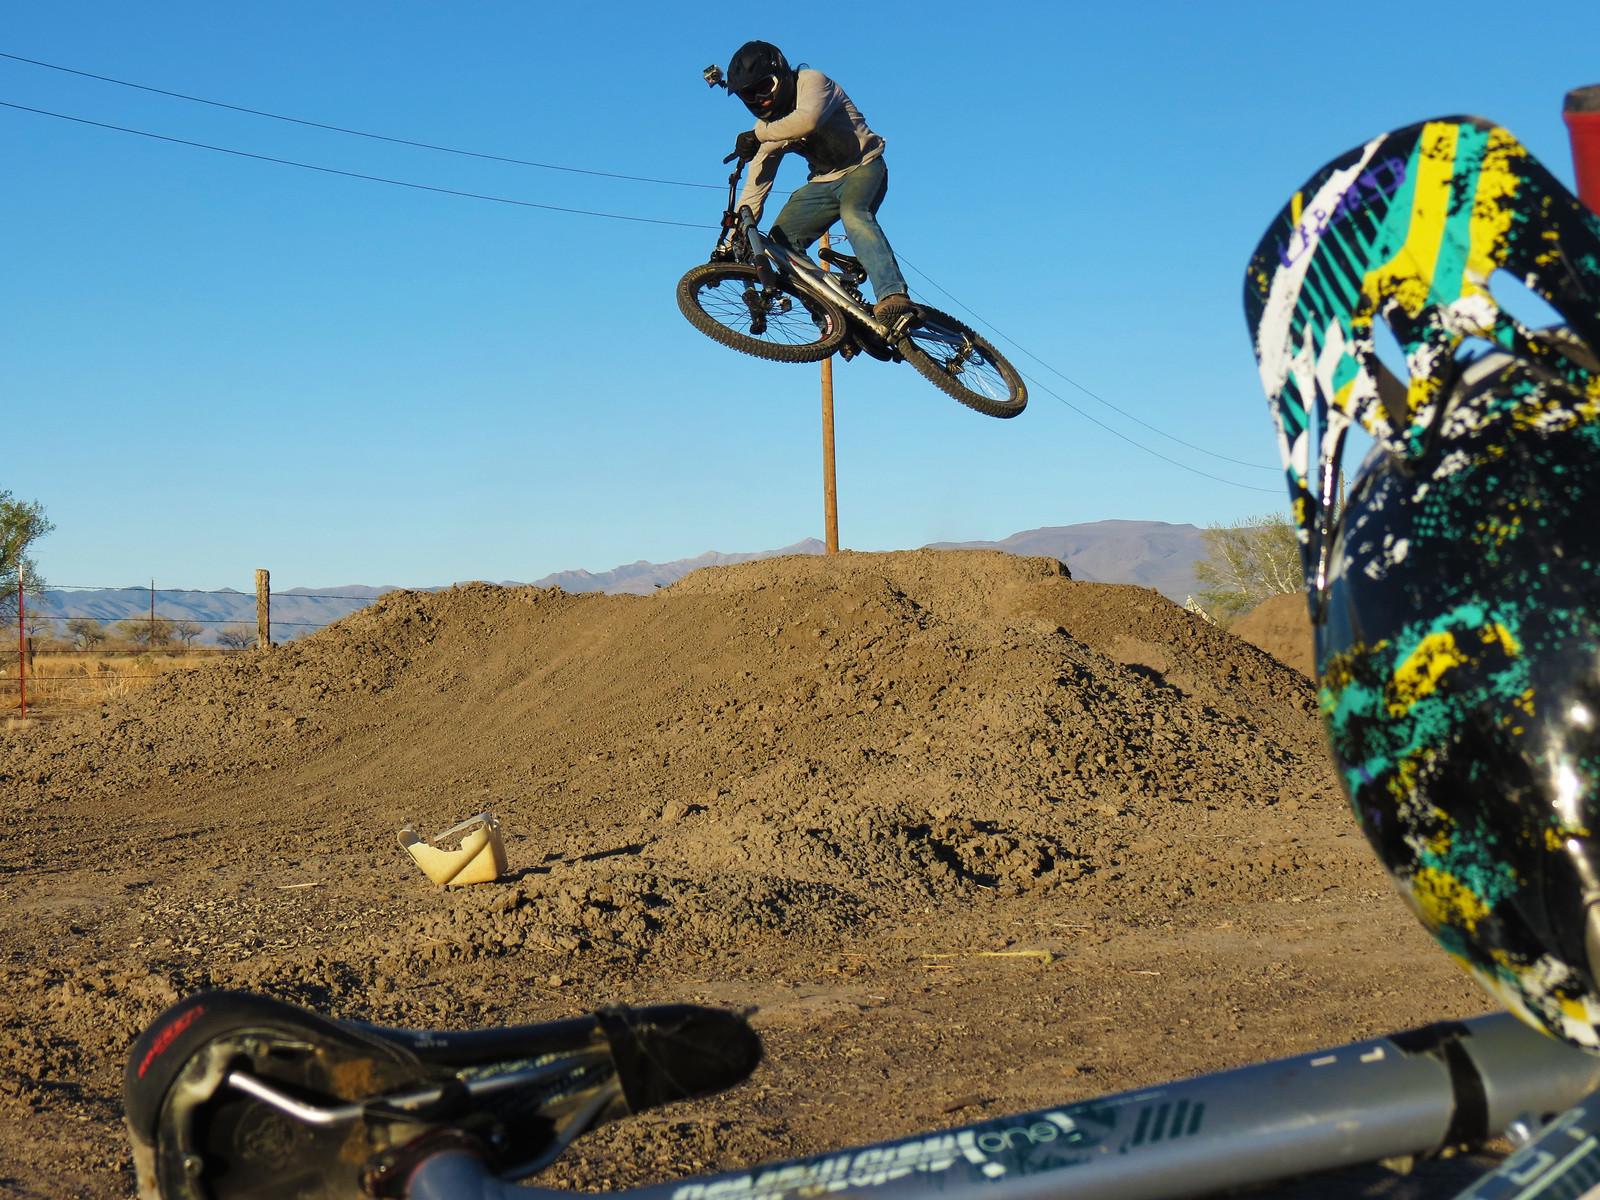 cim whipz 2 - Moosey - Mountain Biking Pictures - Vital MTB